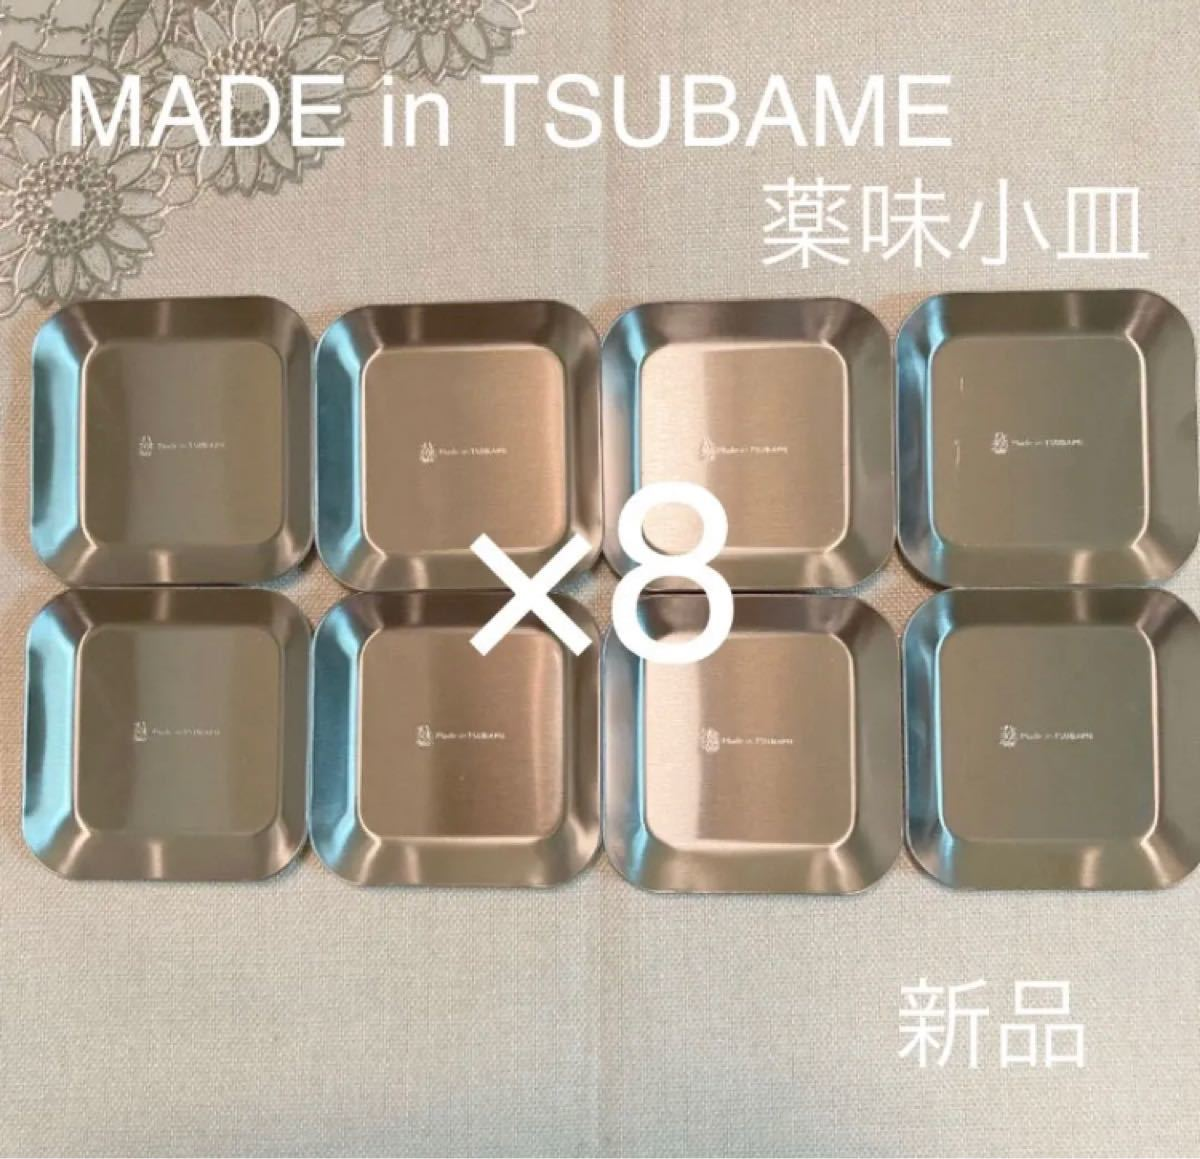 MADE in TSUBAME 薬味小皿8枚 新品 日本製 新潟県燕市燕三条 刻印入り